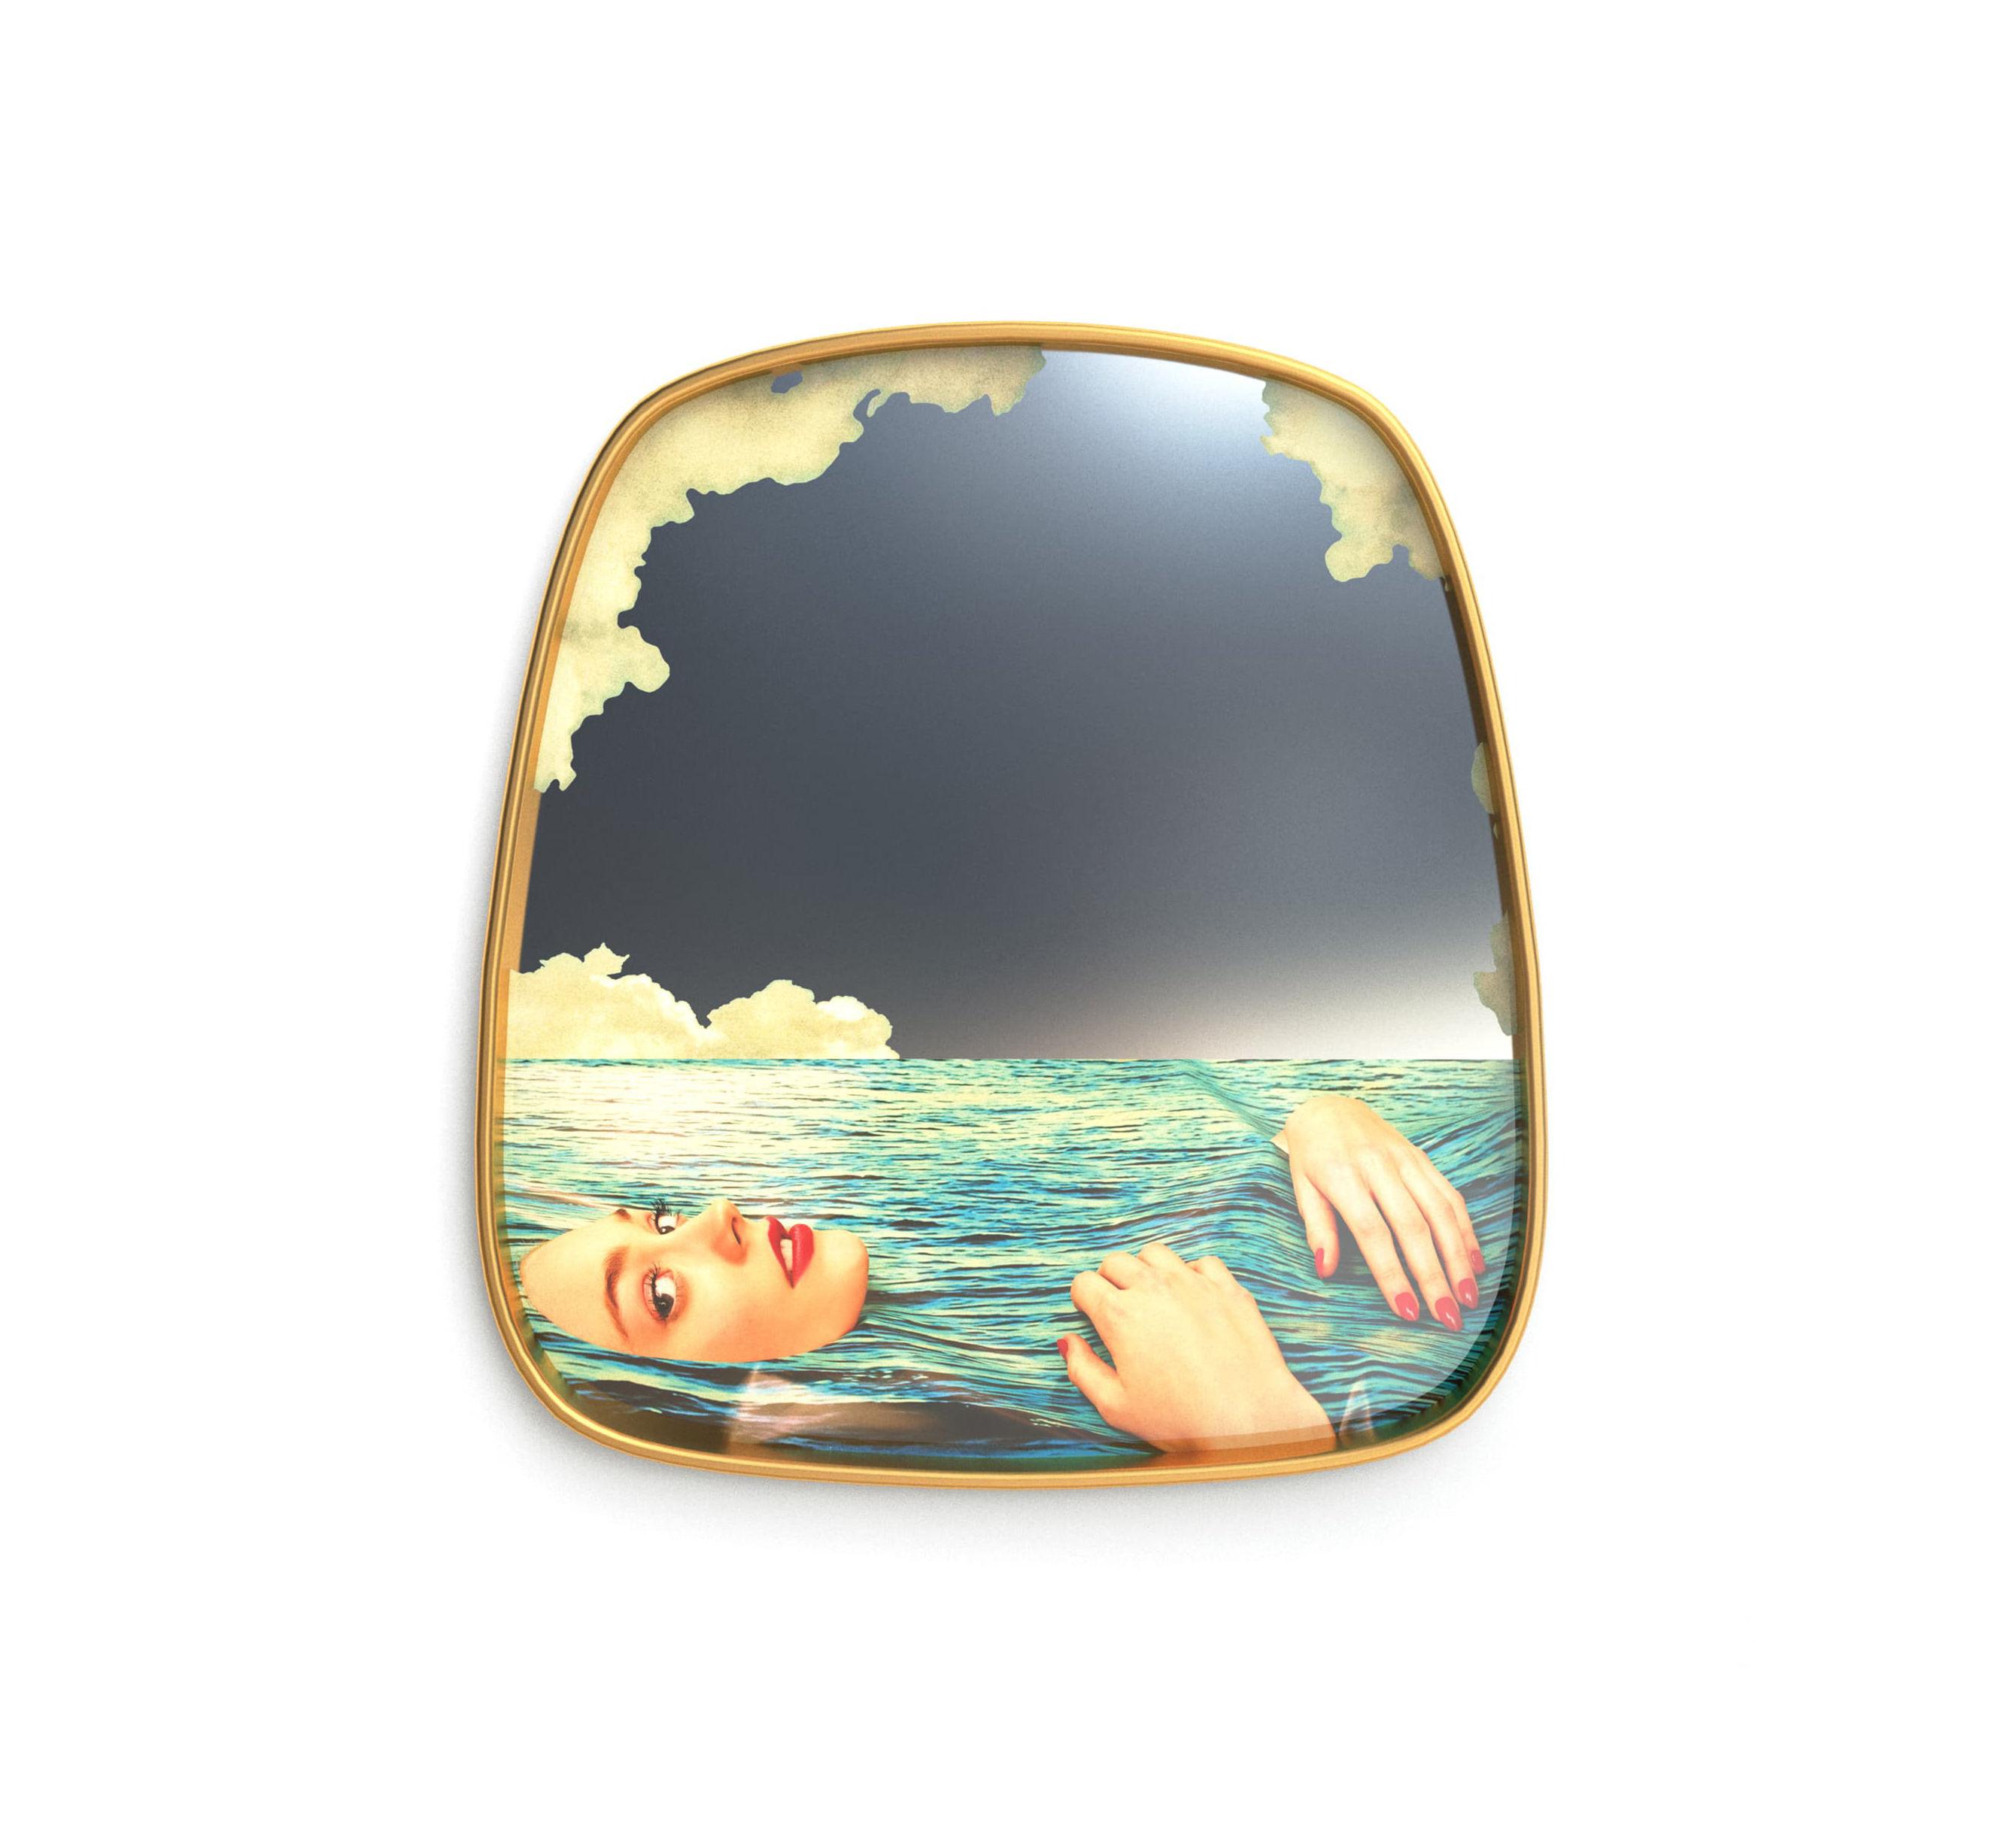 Déco - Miroirs - Miroir Toiletpaper / Sea Girl - 54 x 59 cm - Seletti - Sea Girl / Cadre laiton - Laiton, MDF, Verre